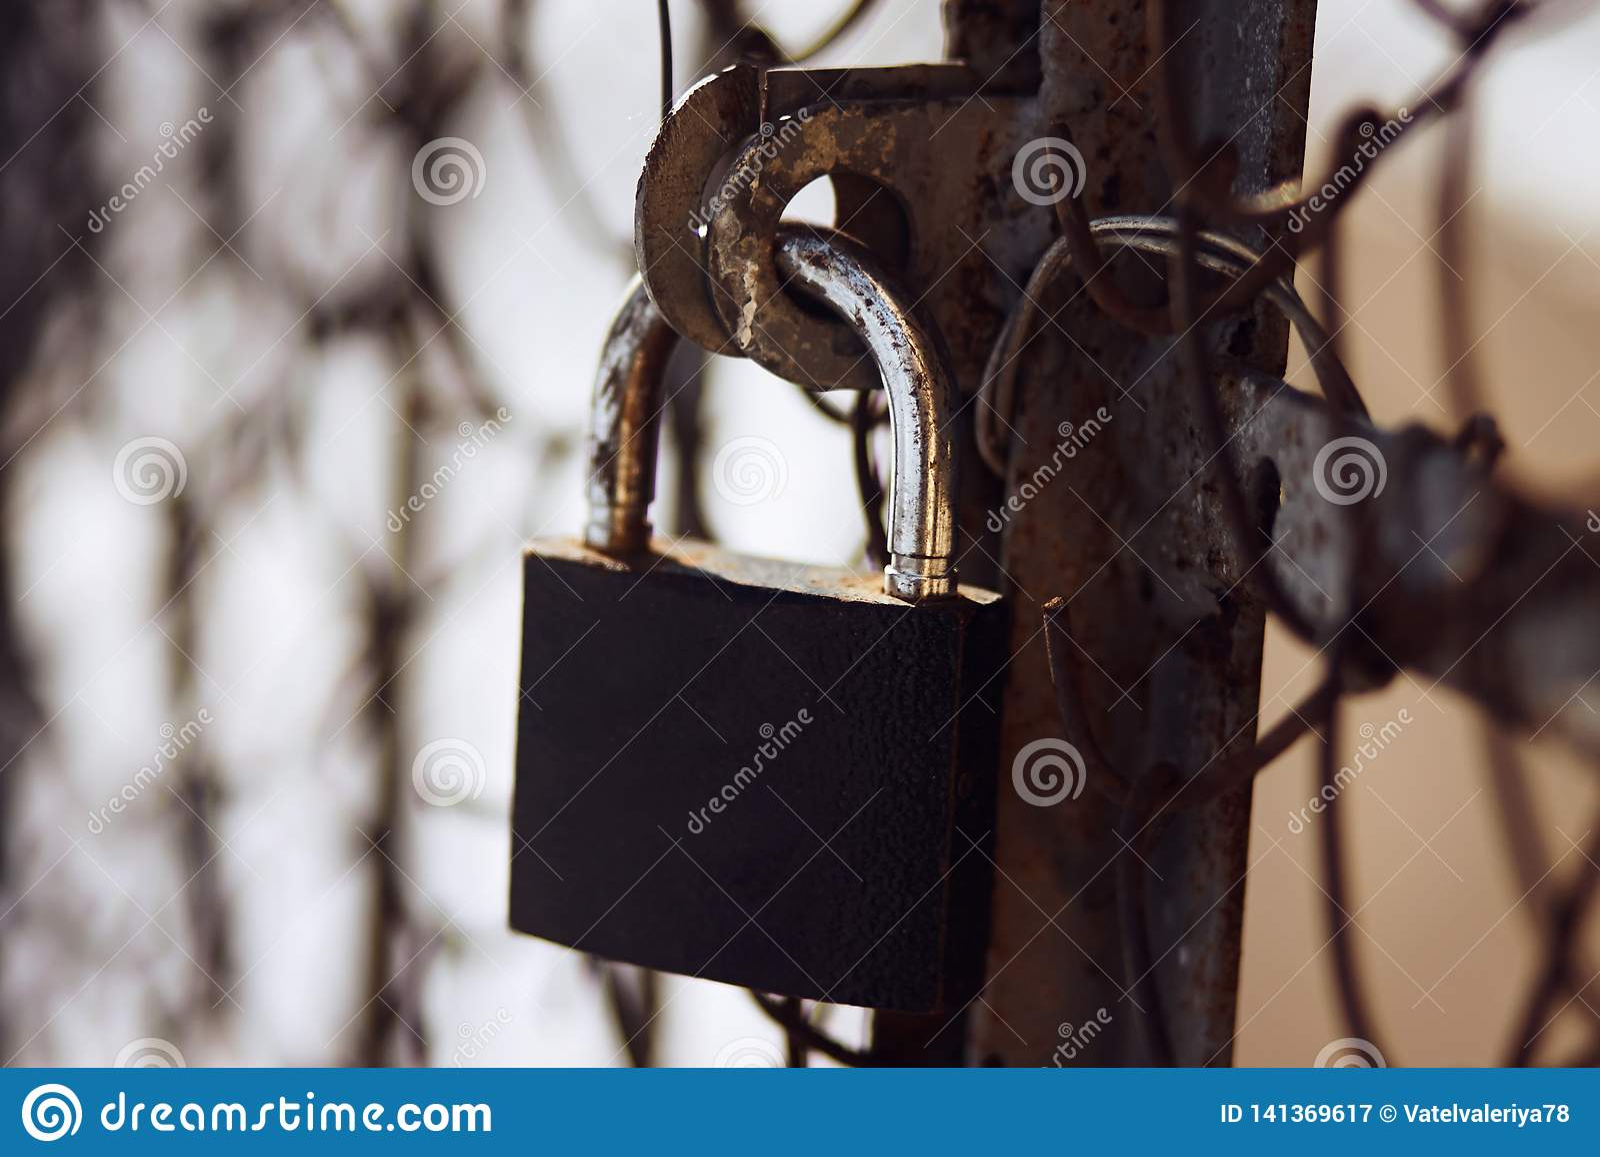 Ржавый затрапезный замок закрывает ржавые старые ворота